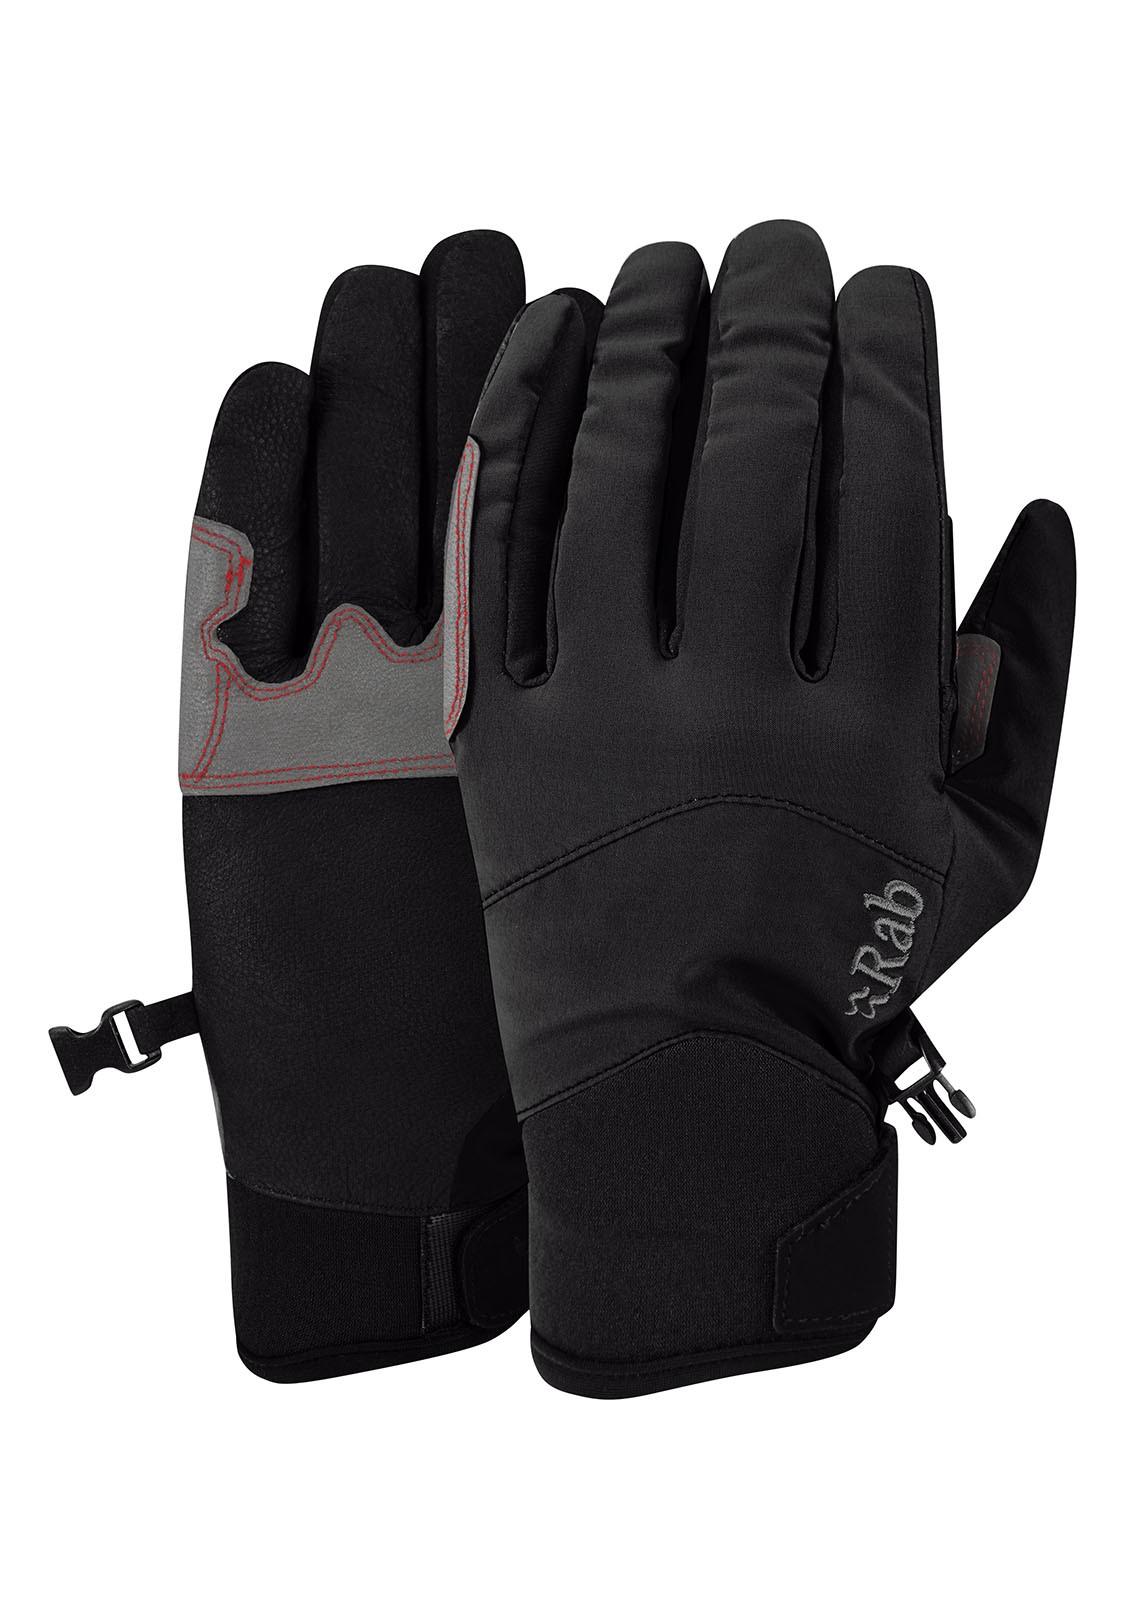 Rab M14 Glove Black pánské softshellové lezecké rukavice ... ebd7712d25